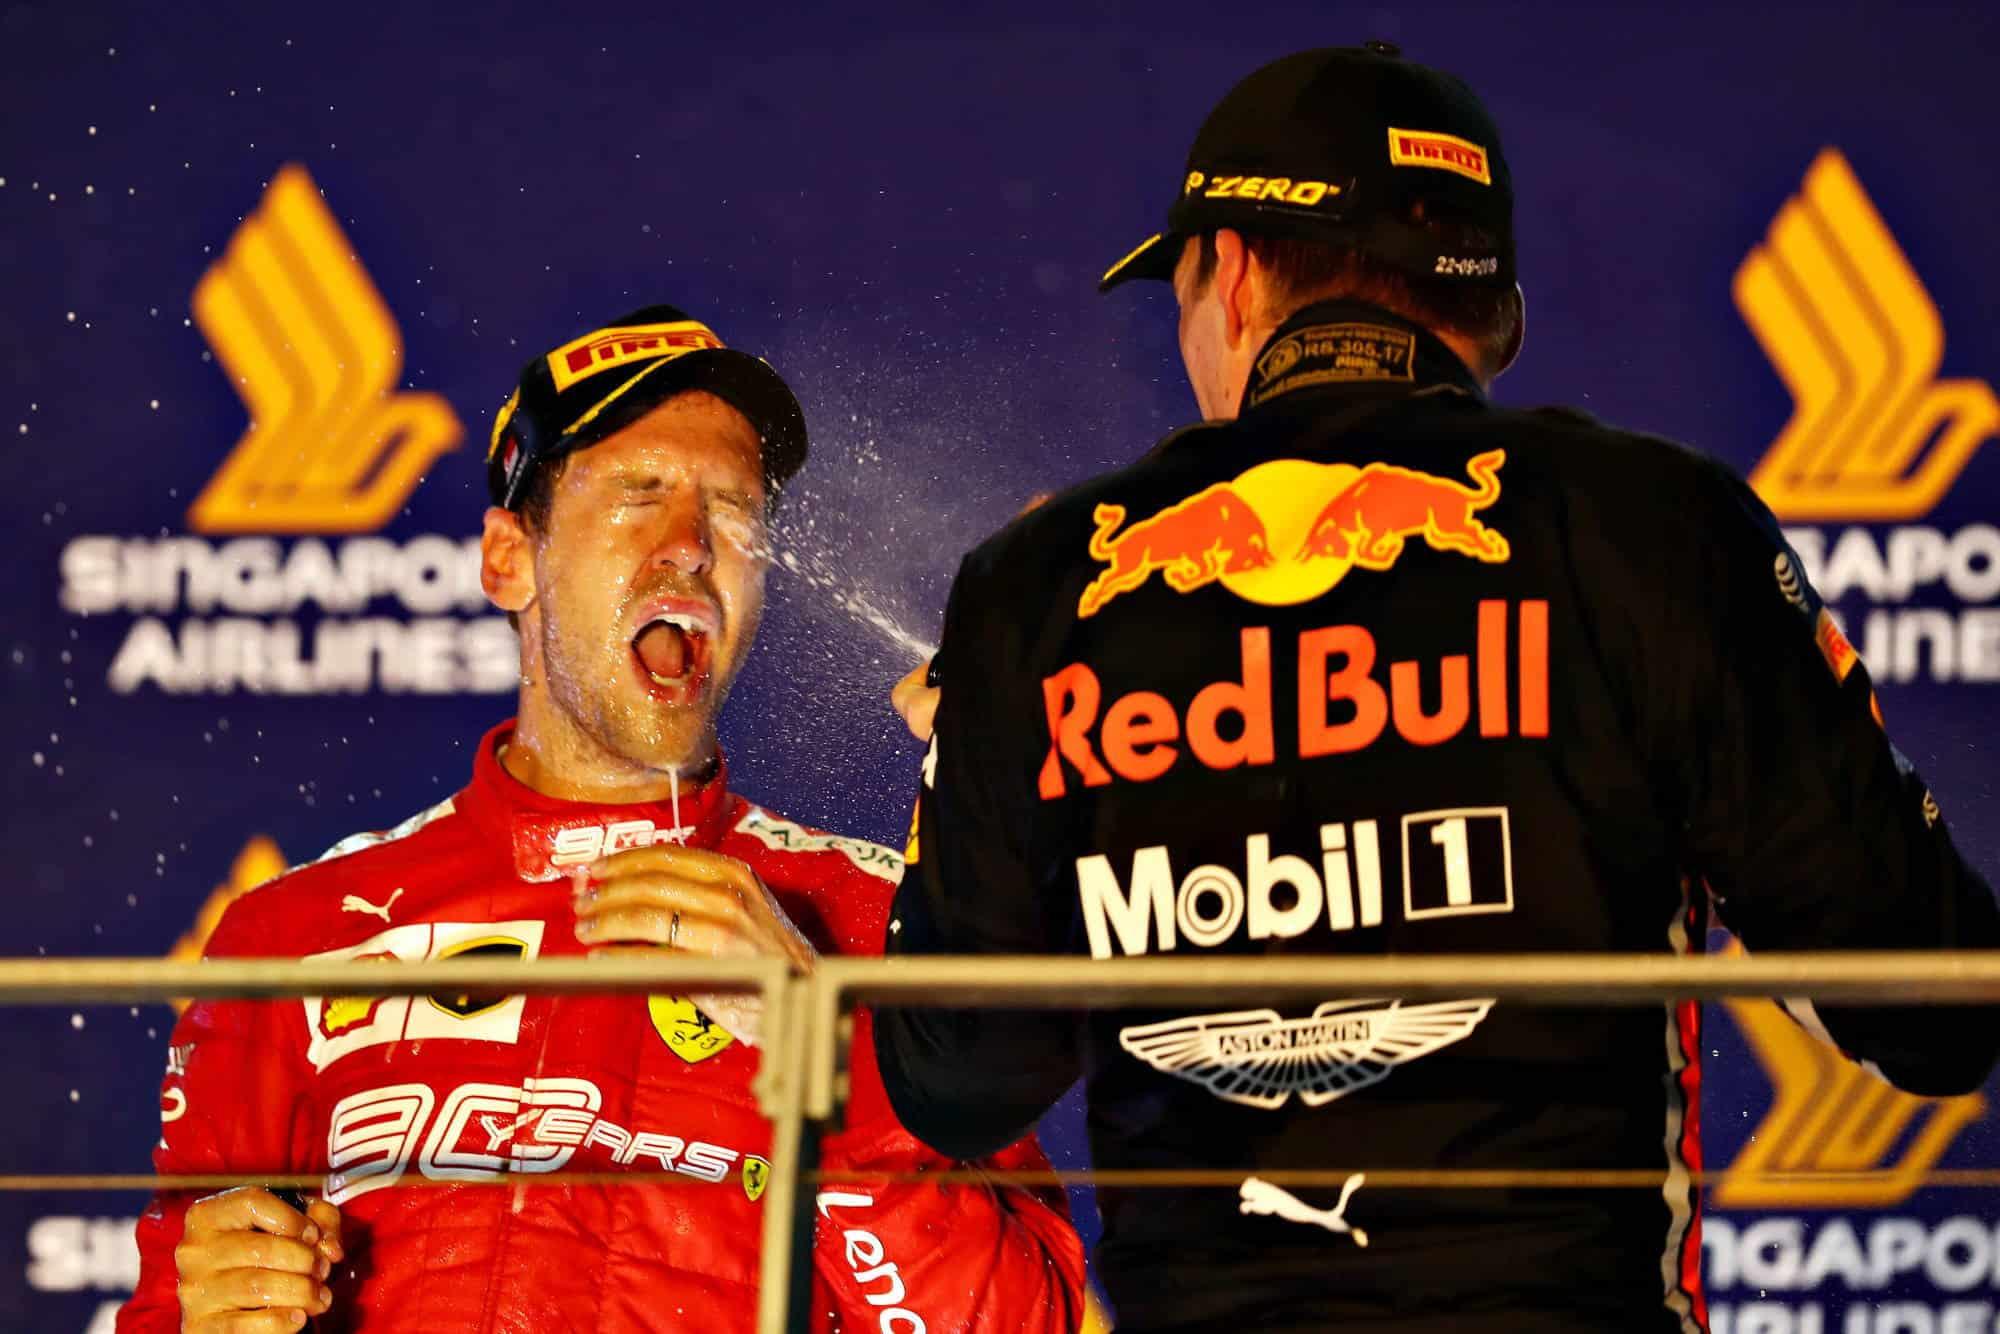 Vettel and Verstappen Singapore GP F1 2019 champagne on the podium Photo Red Bull